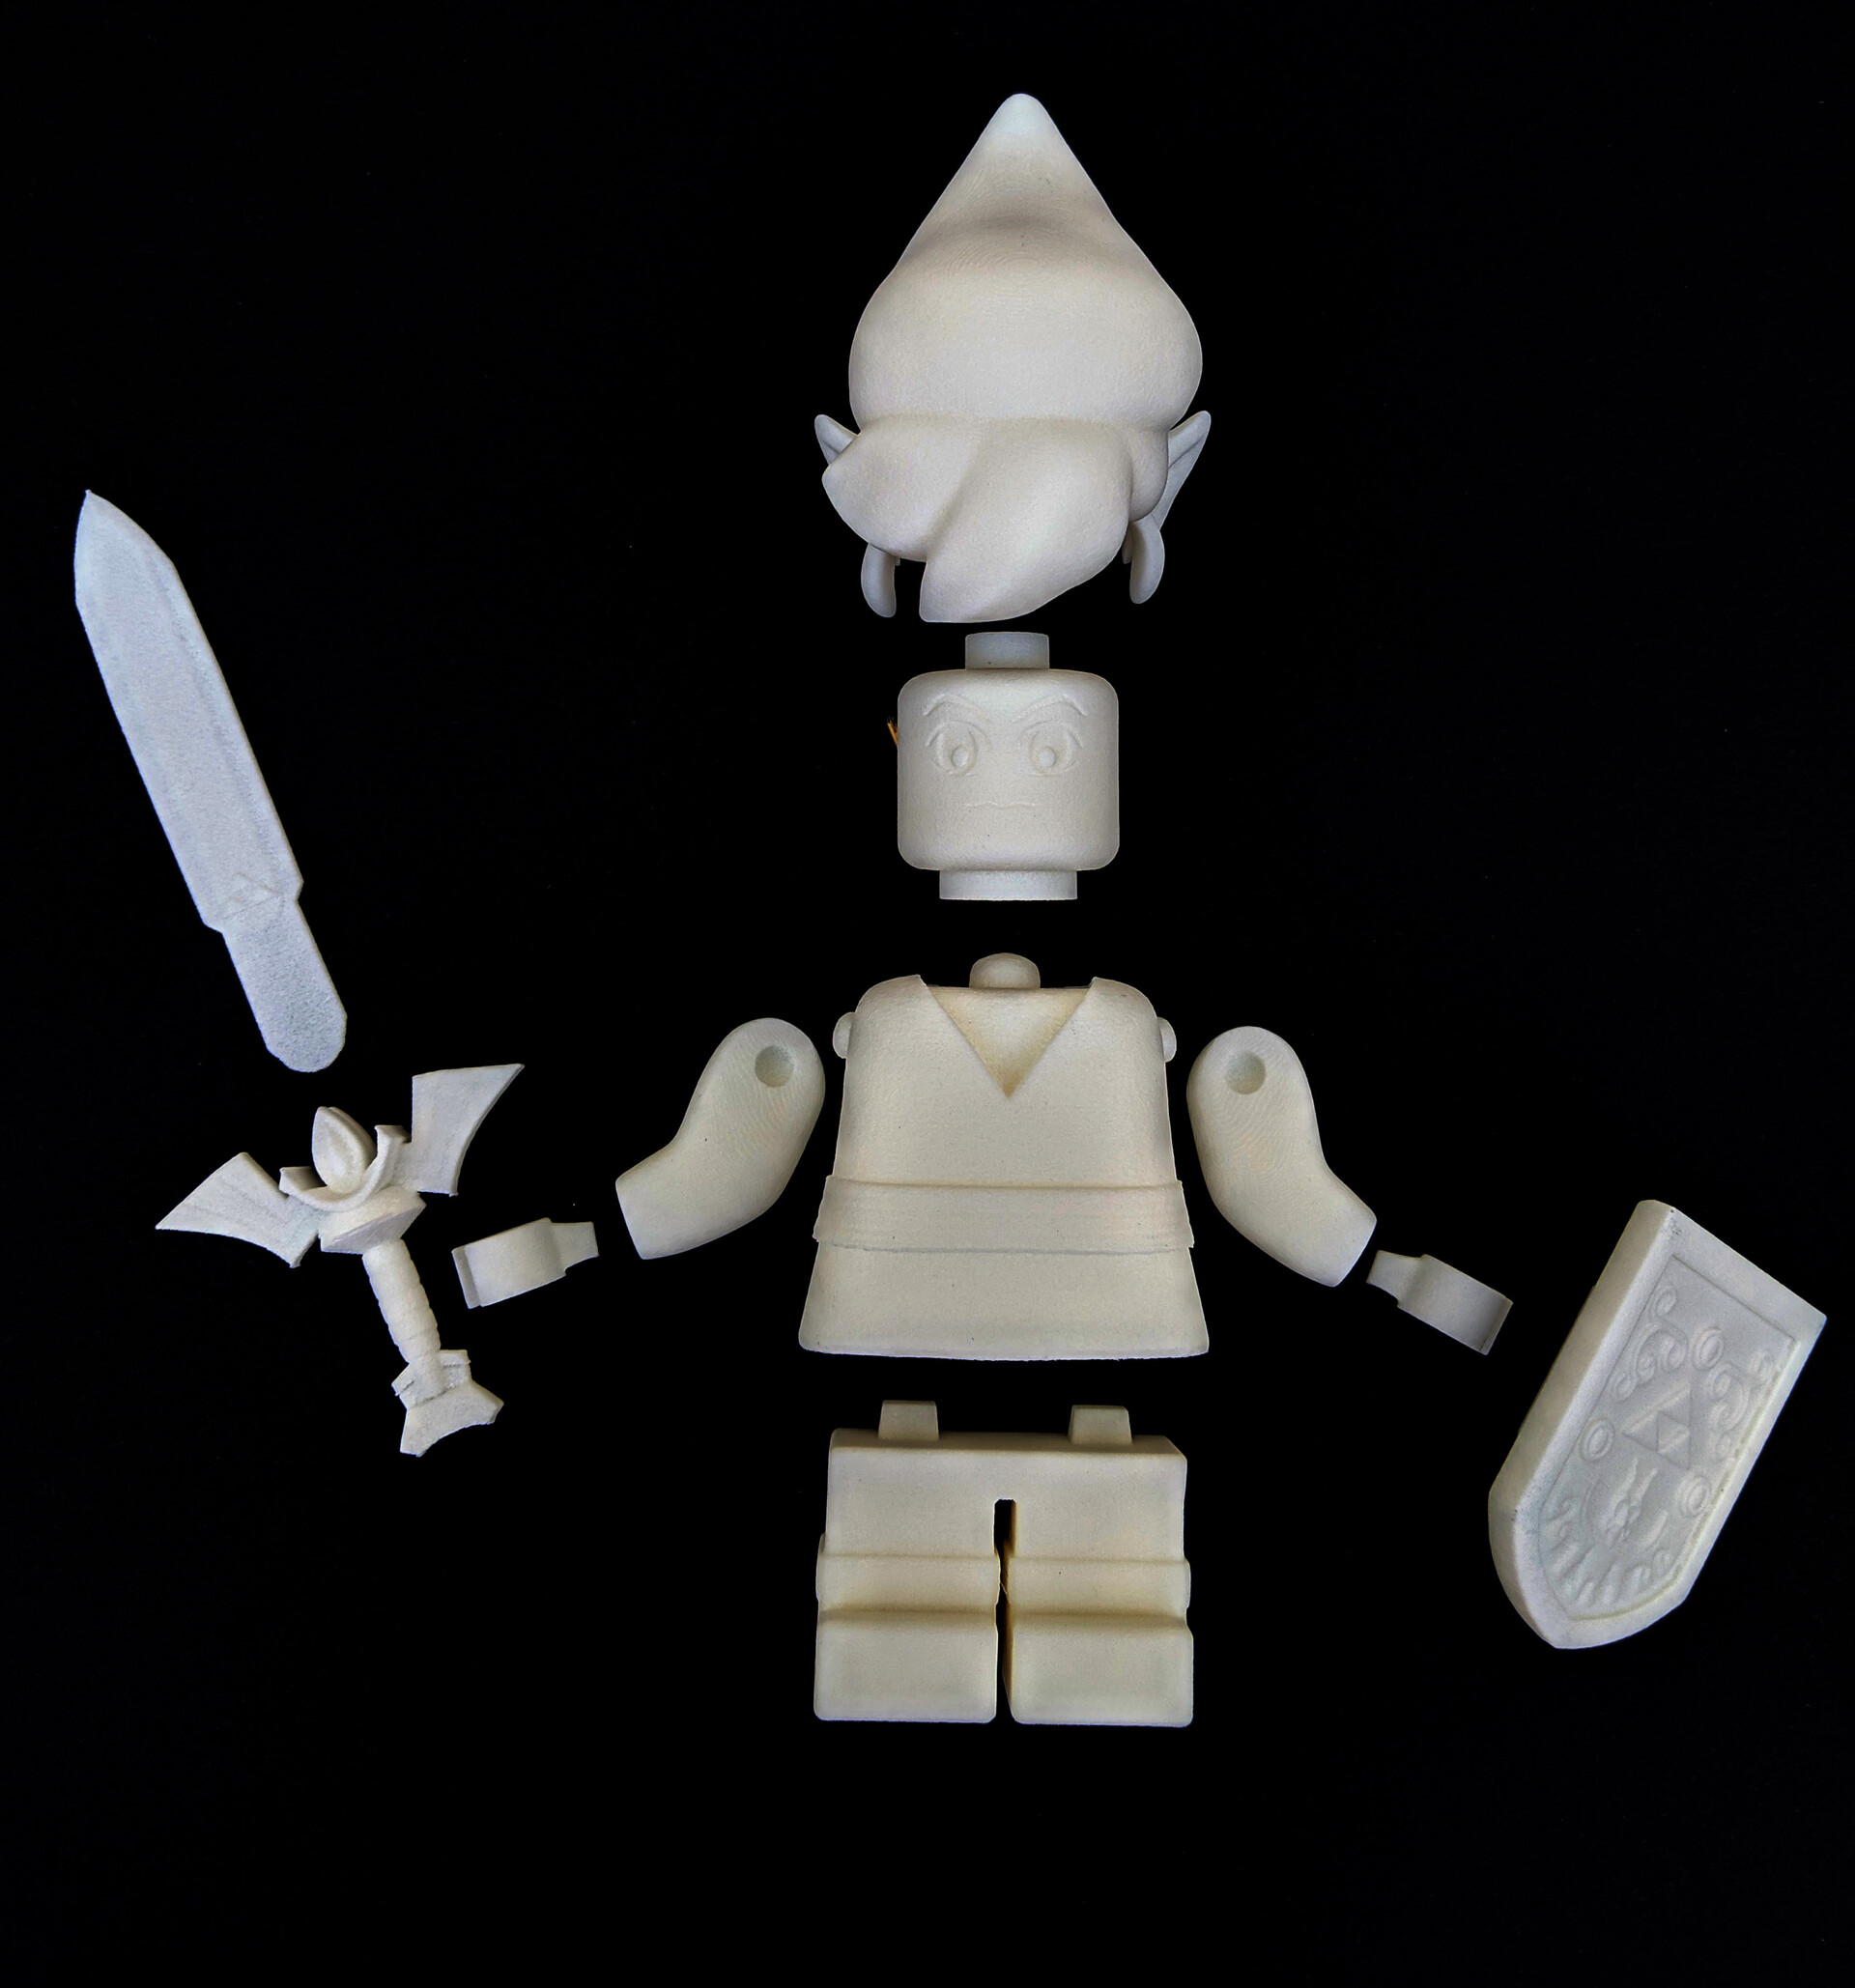 Raw print parts